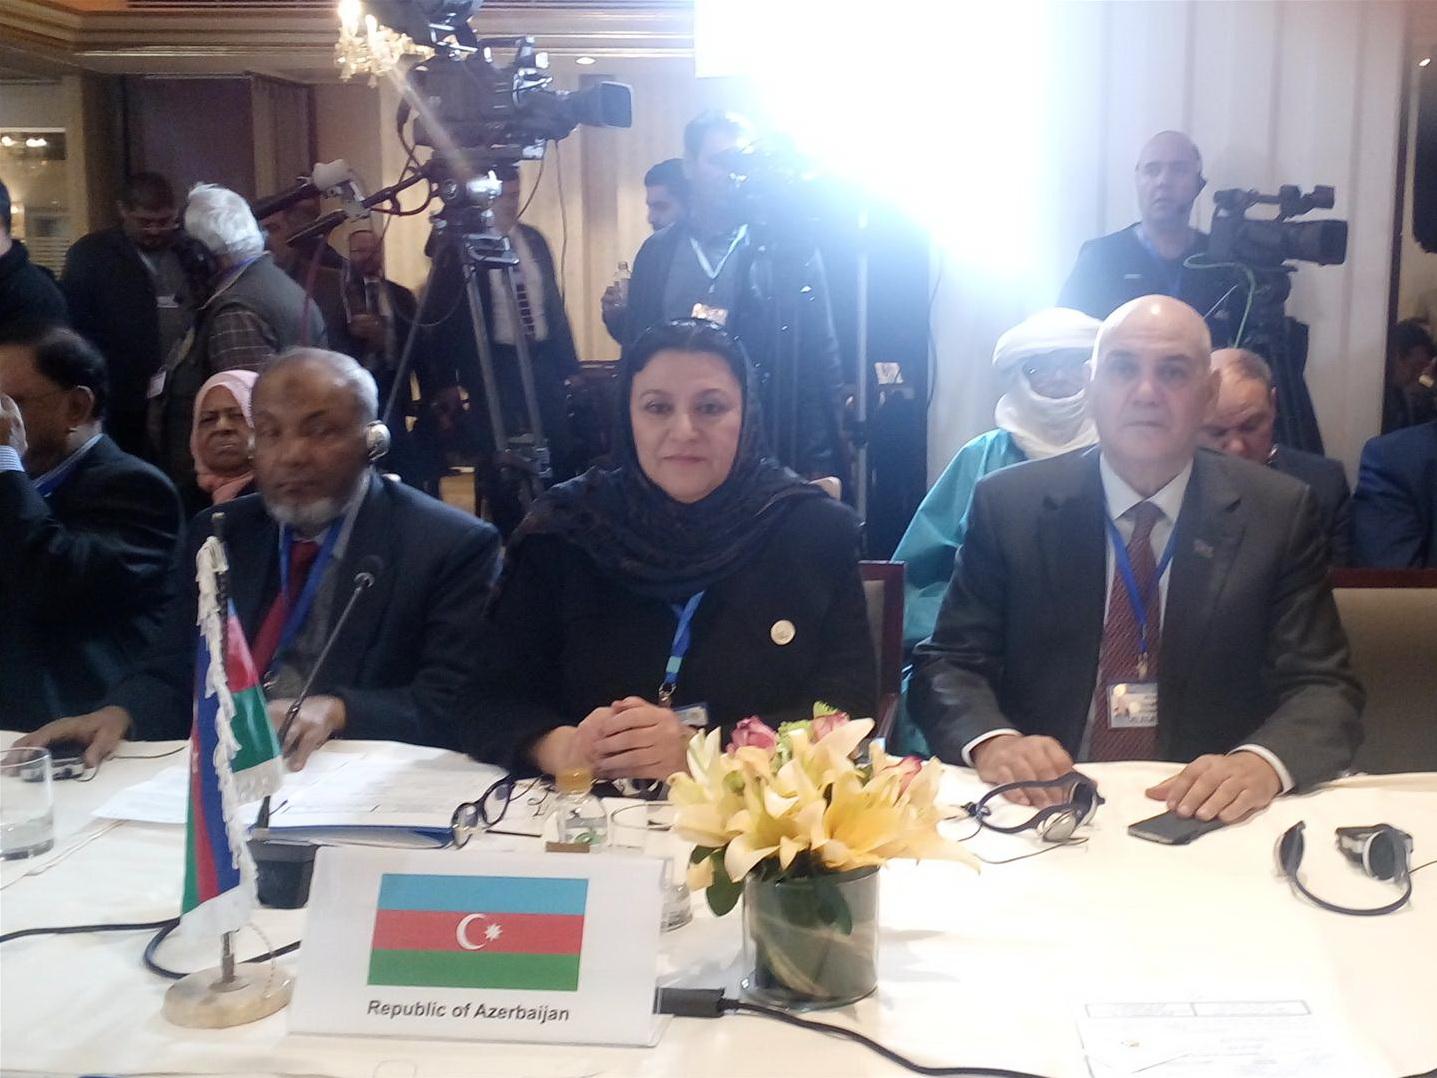 На XIII сессии Парламентского Союза ОИС приняты 2 резолюции по Азербайджану - ФОТО